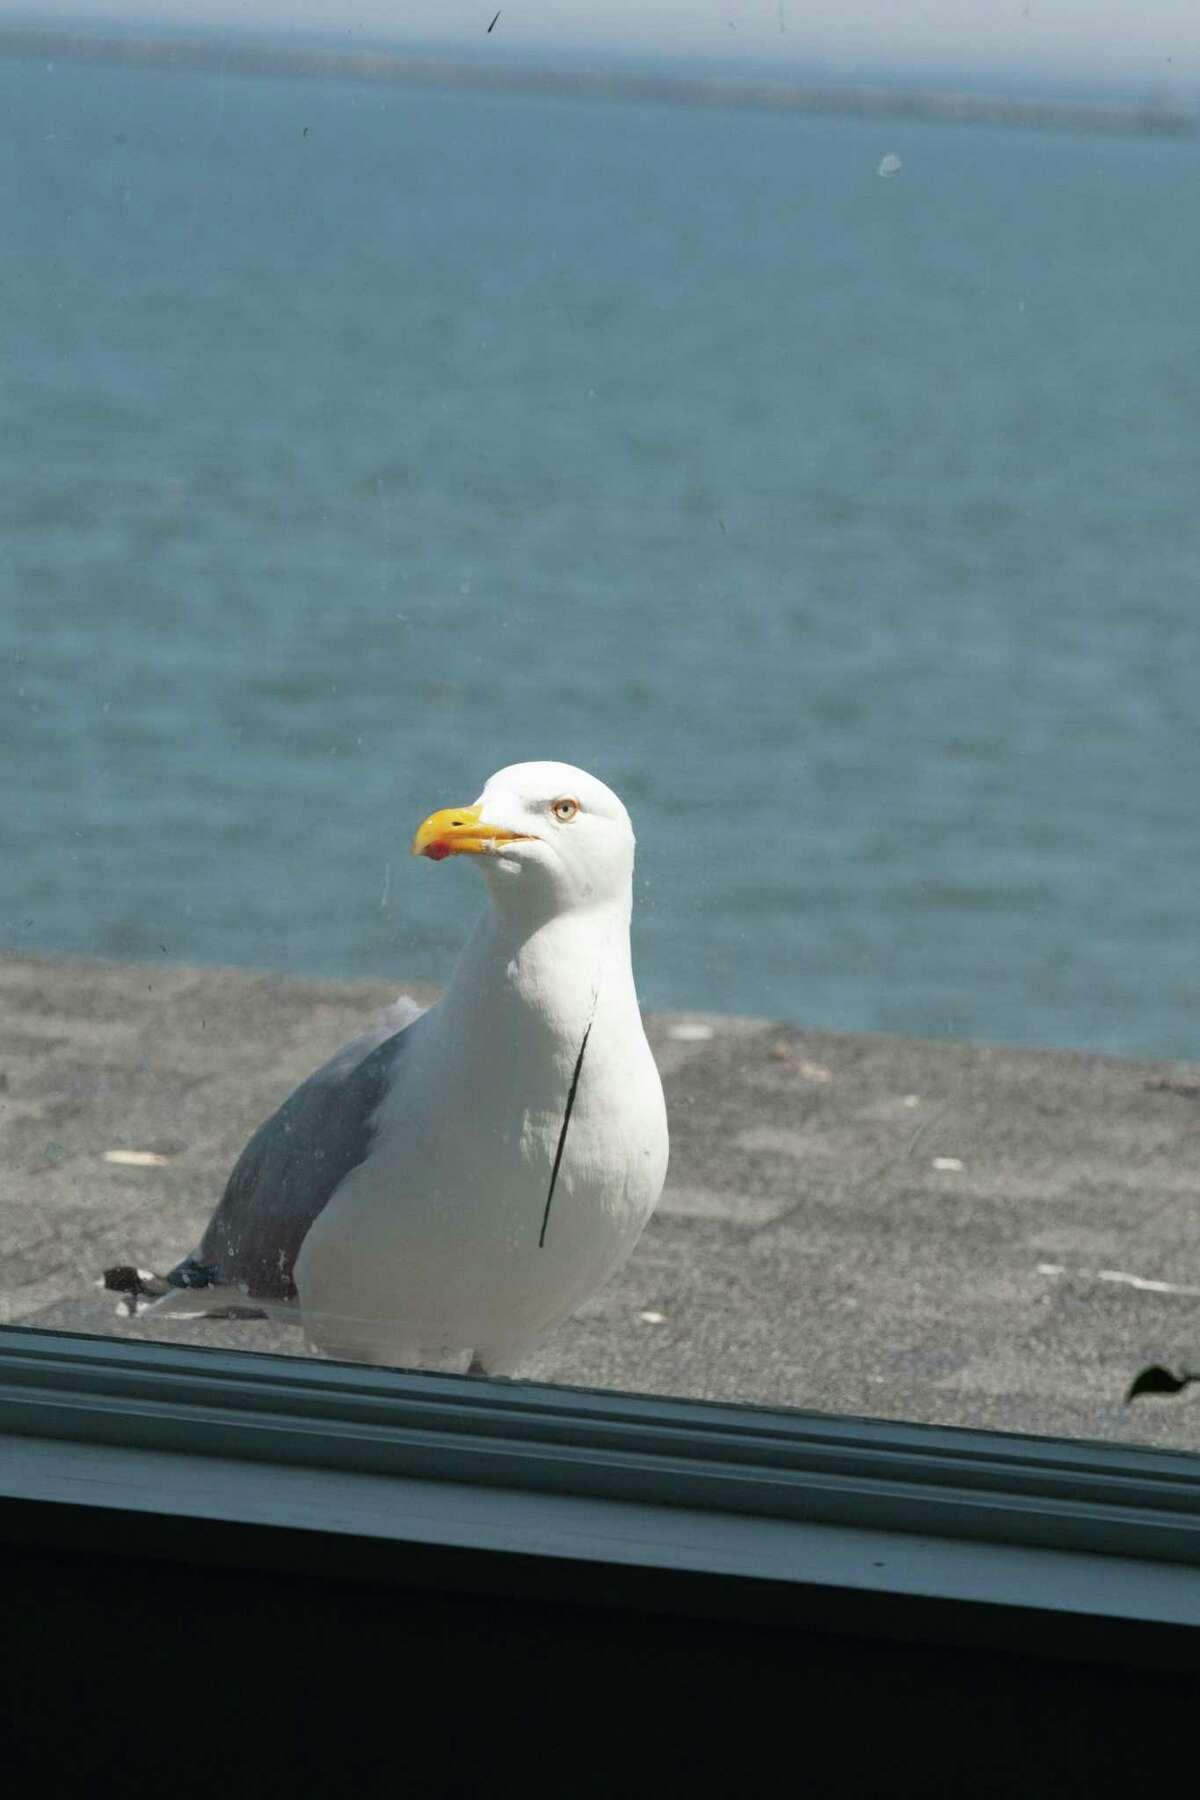 Smeagull at the Sliding Glass Door